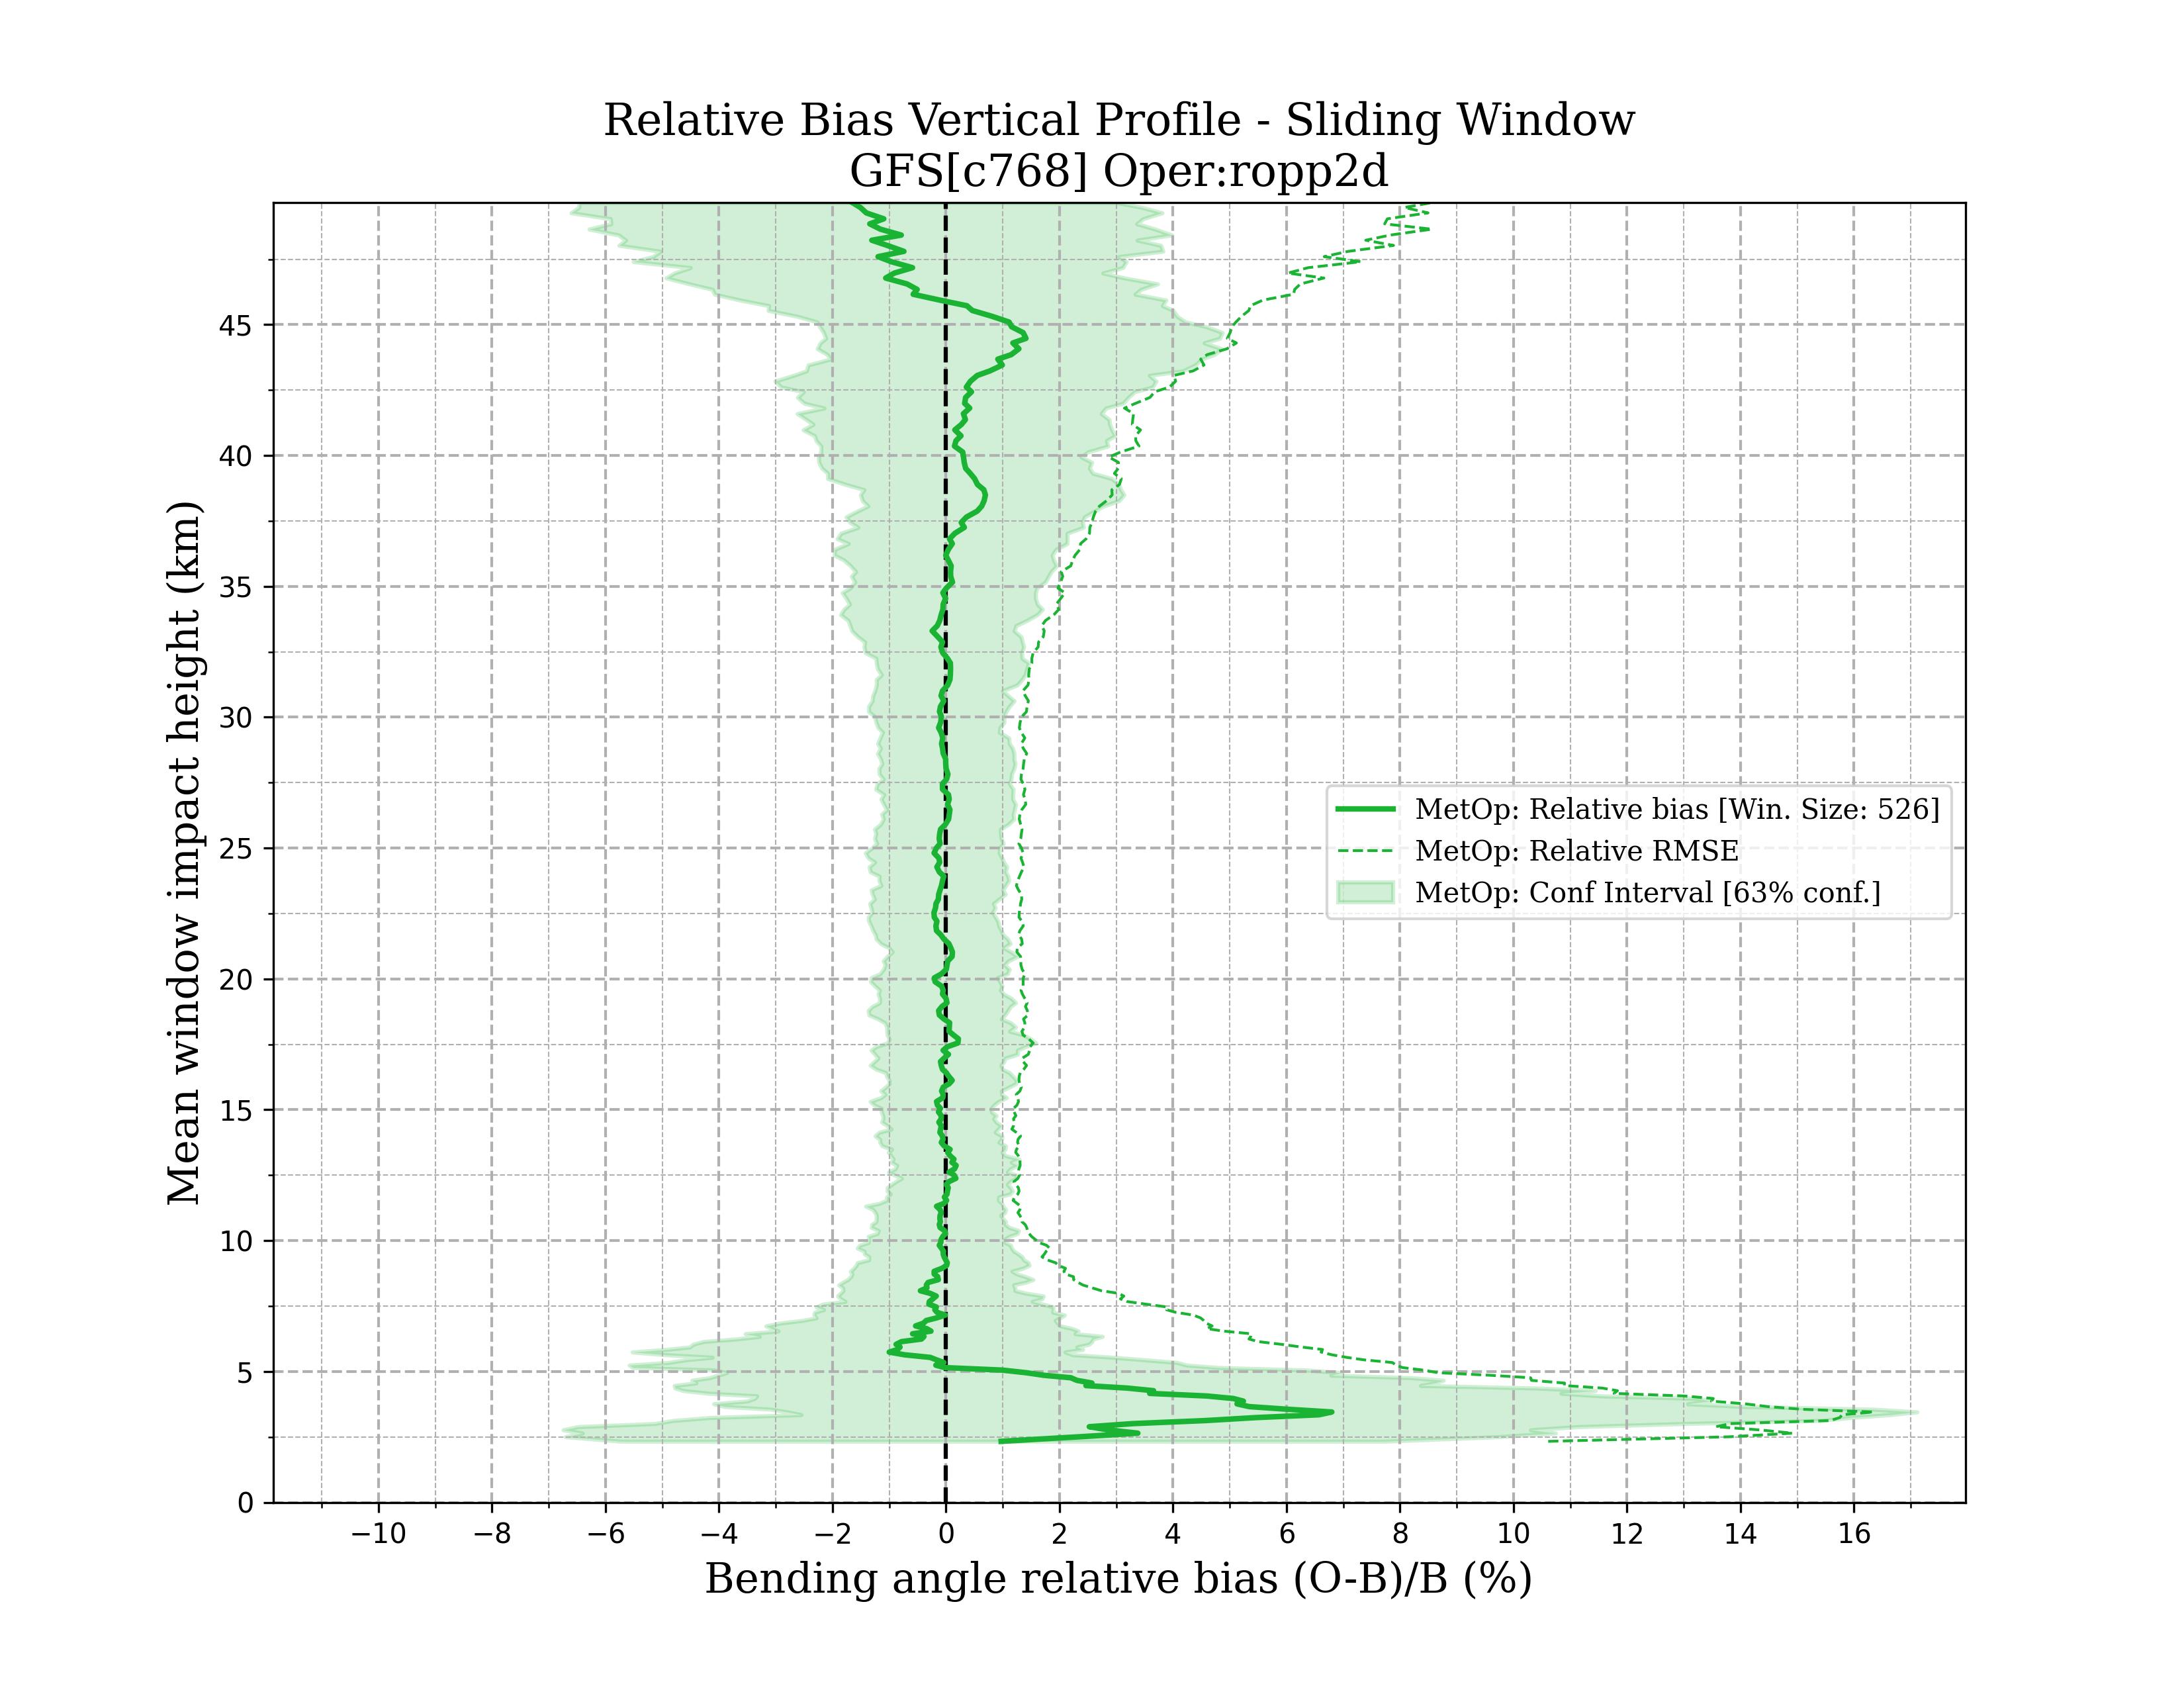 metop ropp2d vertical_profile_sw